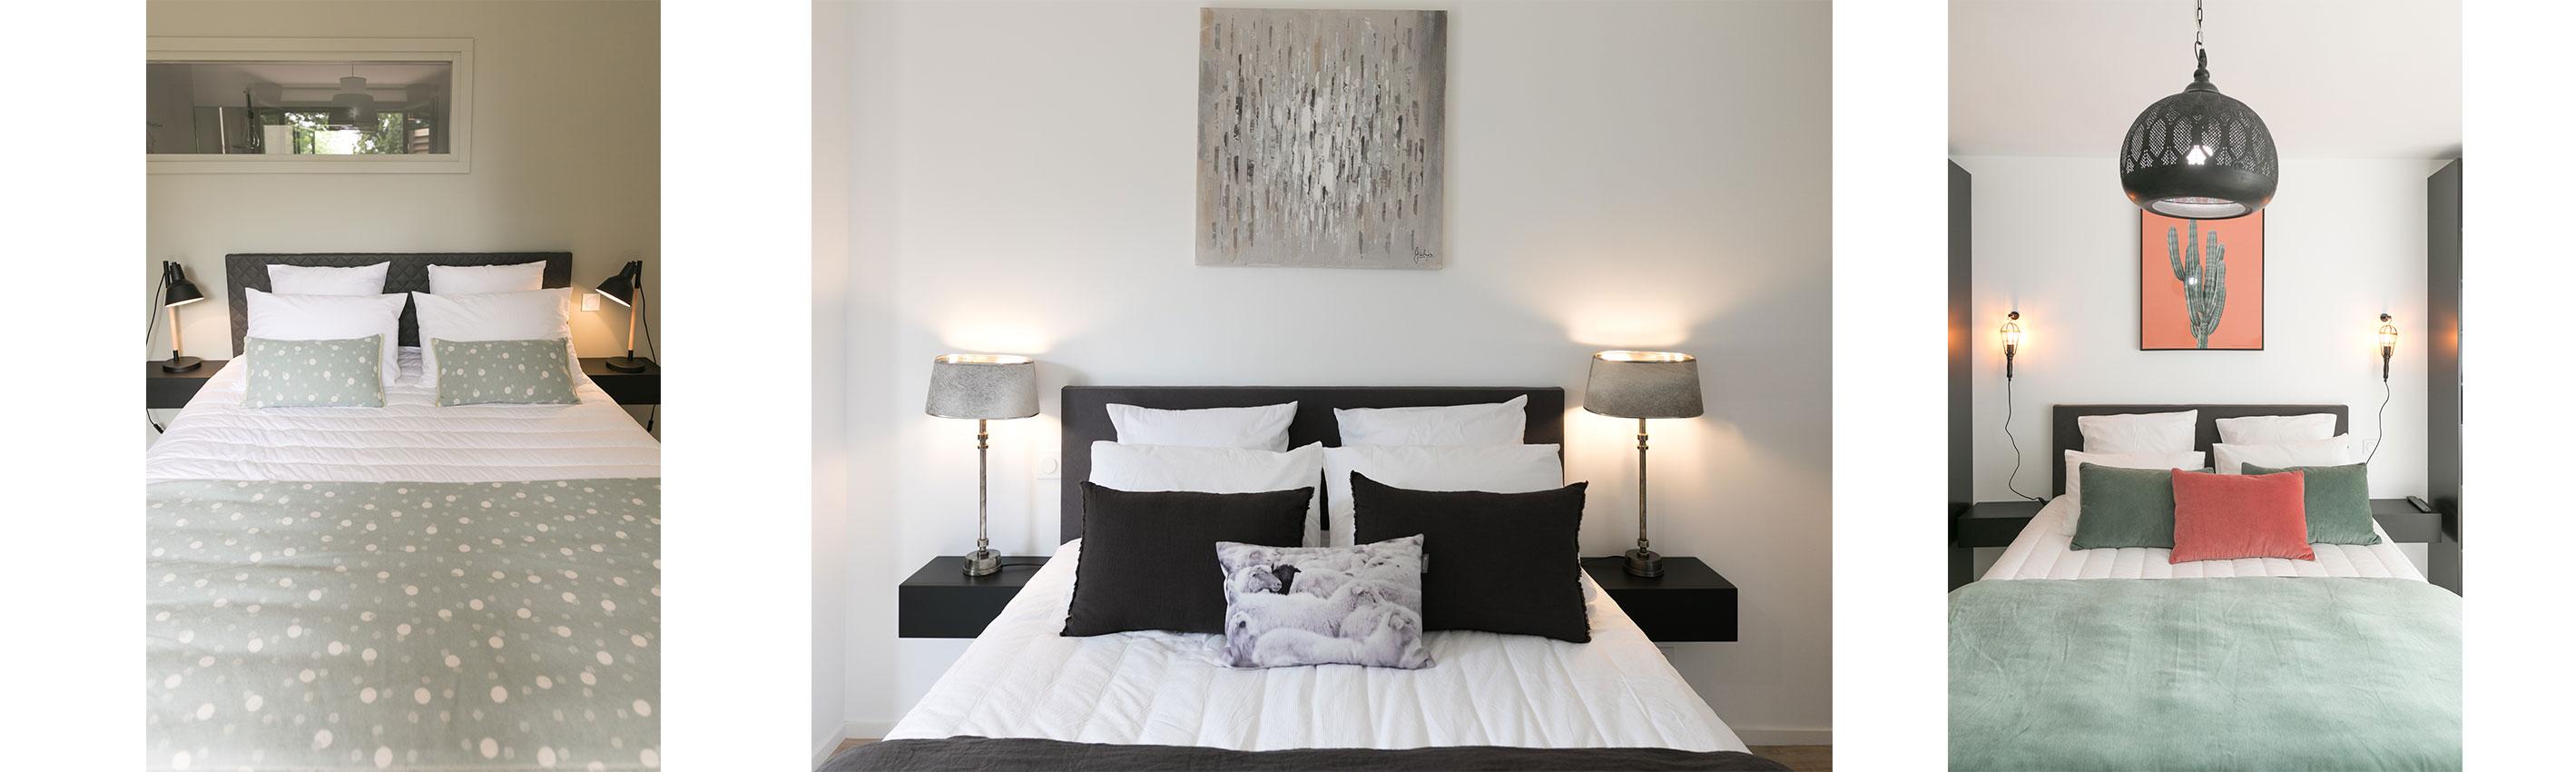 Maison d'hôtes, petit hotel de charme Ploërmel Morbihan Bretagne